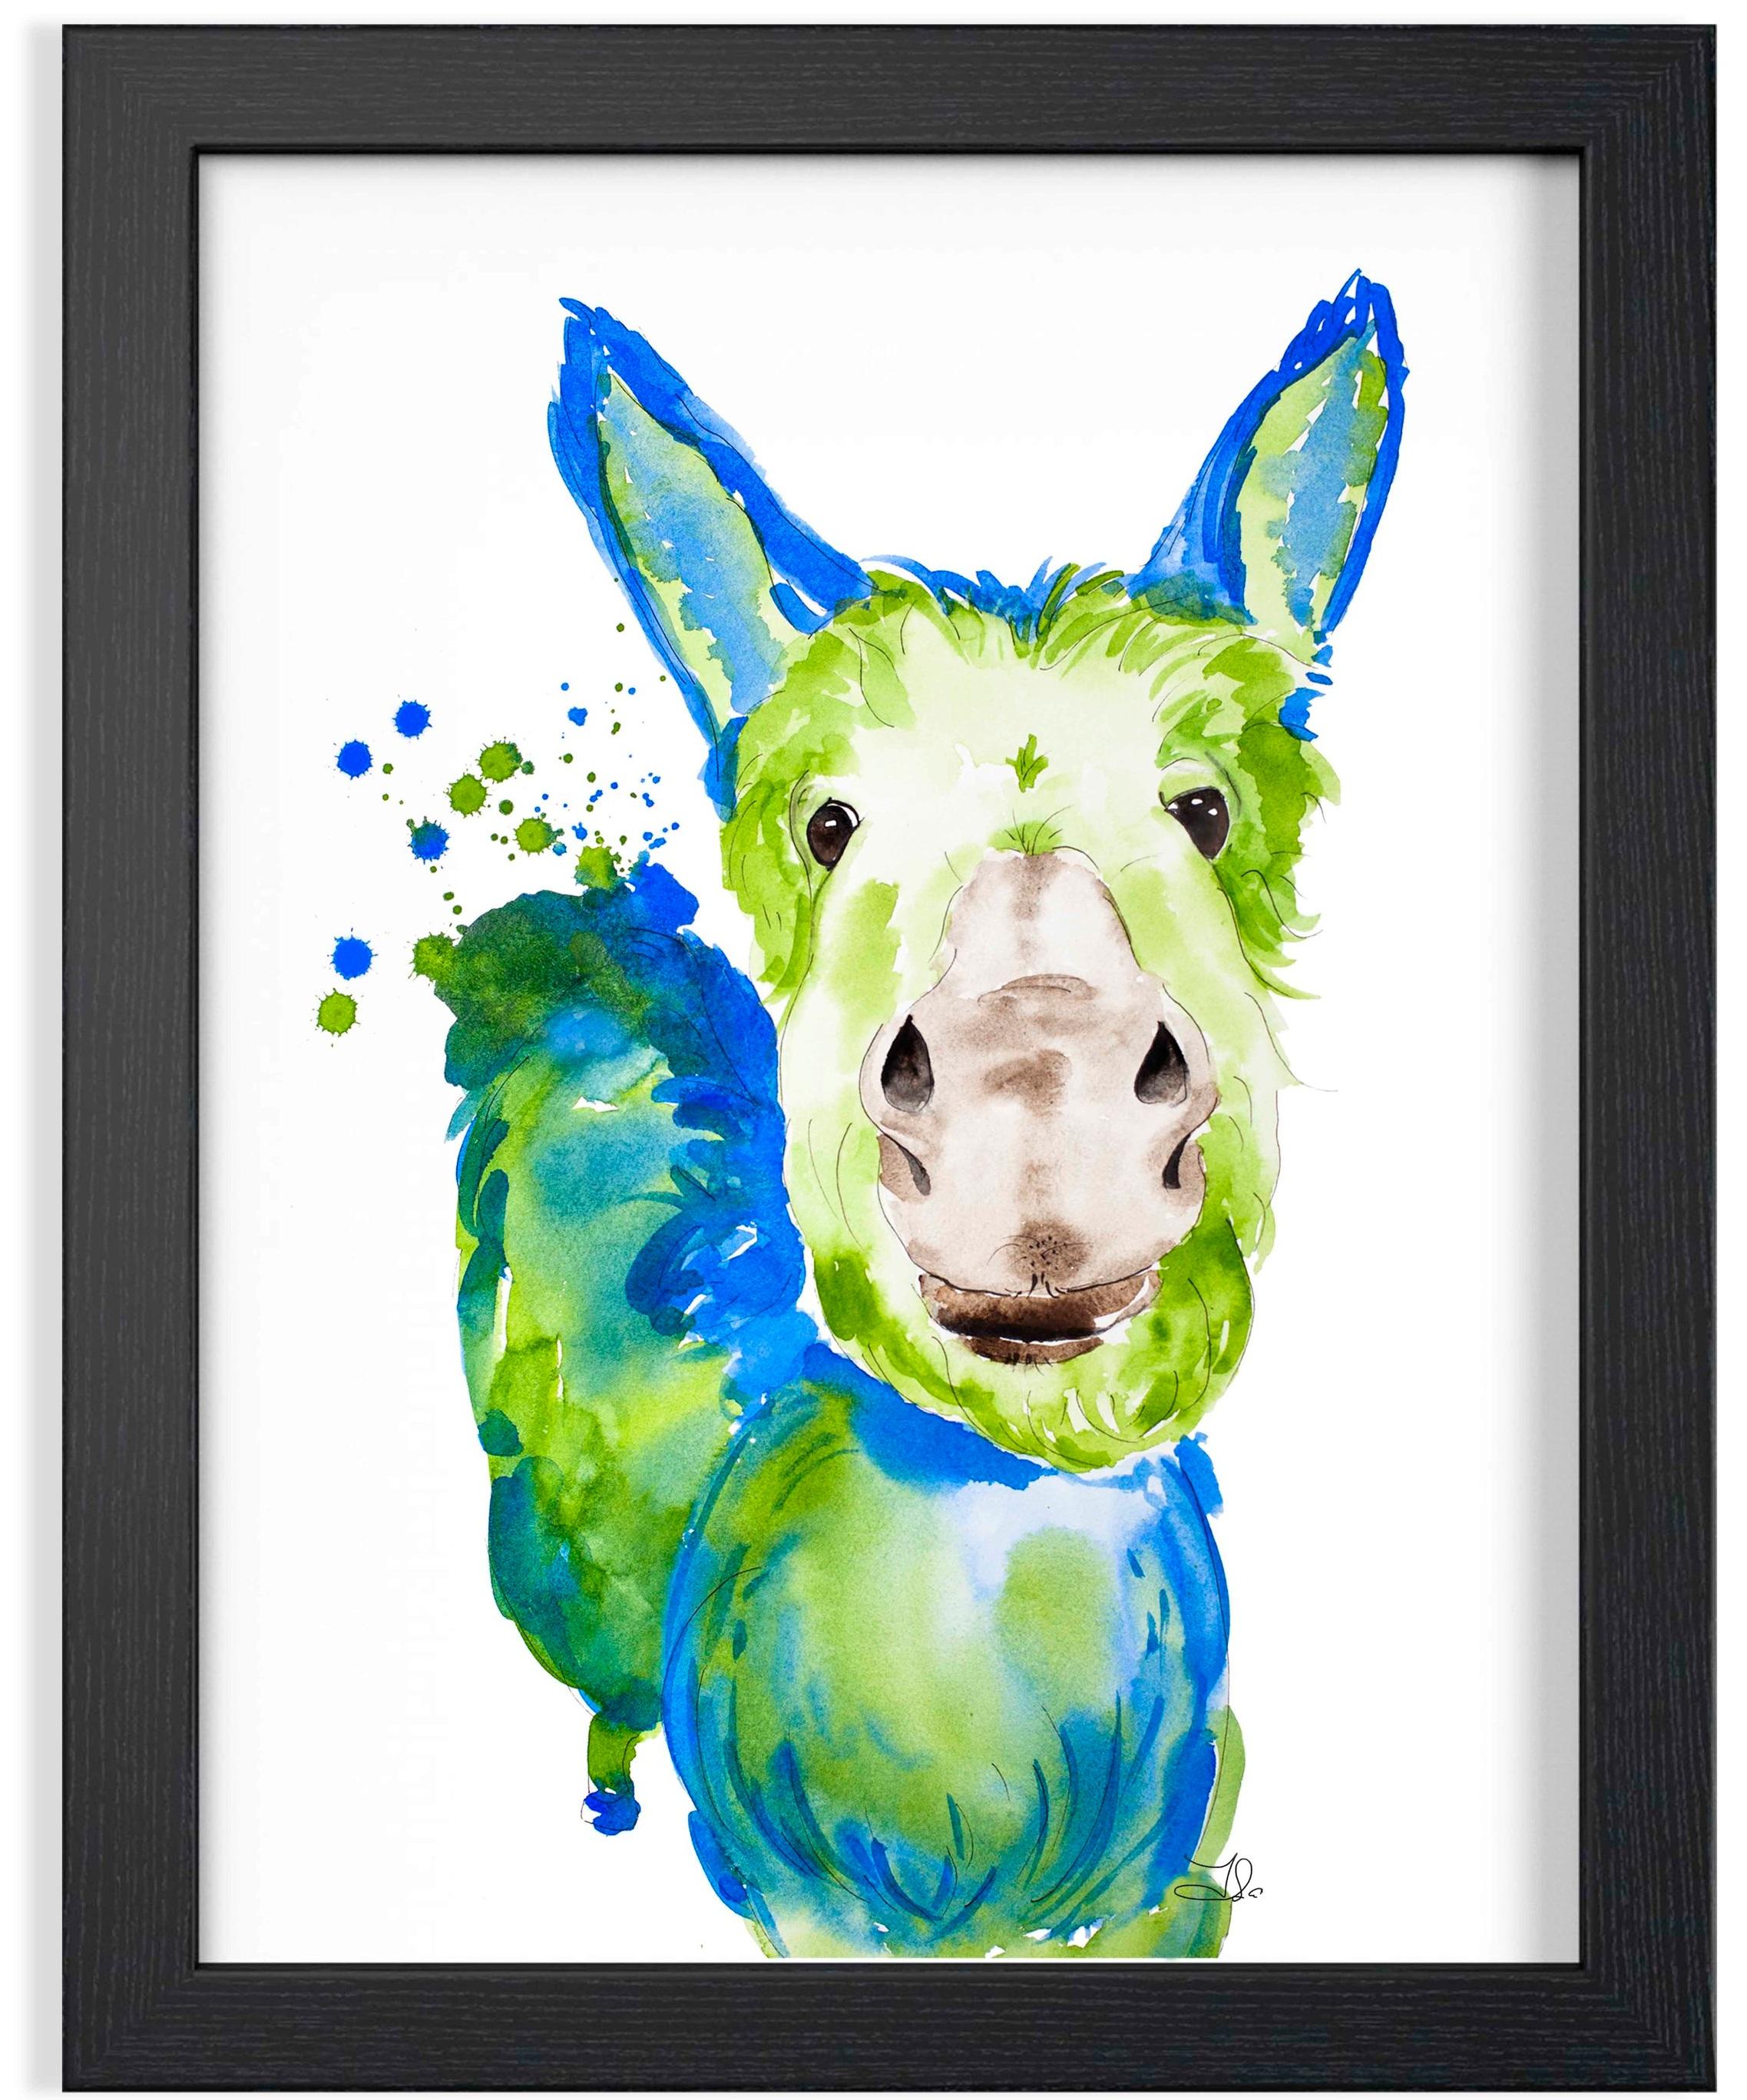 "Donkey Watercolor  189. 00 $CA Fabriano Artistico 100% Cotton  Original watercolor painting 16 x 20"" (41 x 51 cm)"